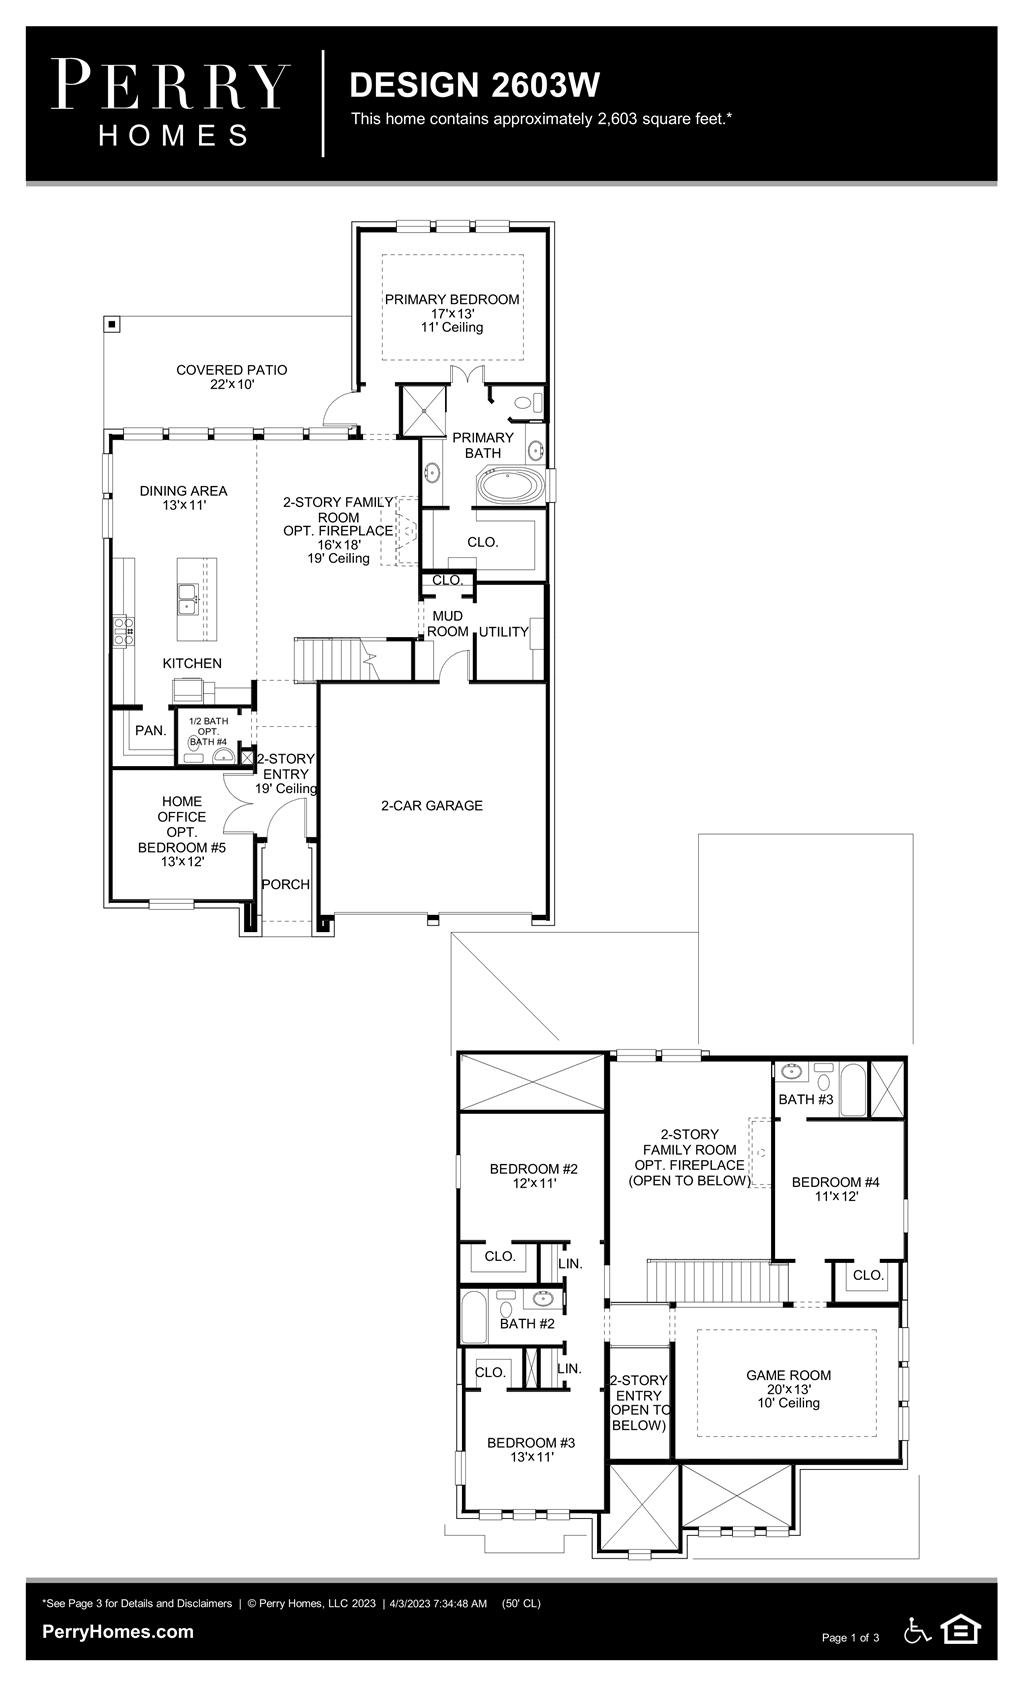 Floor Plan for 2603W